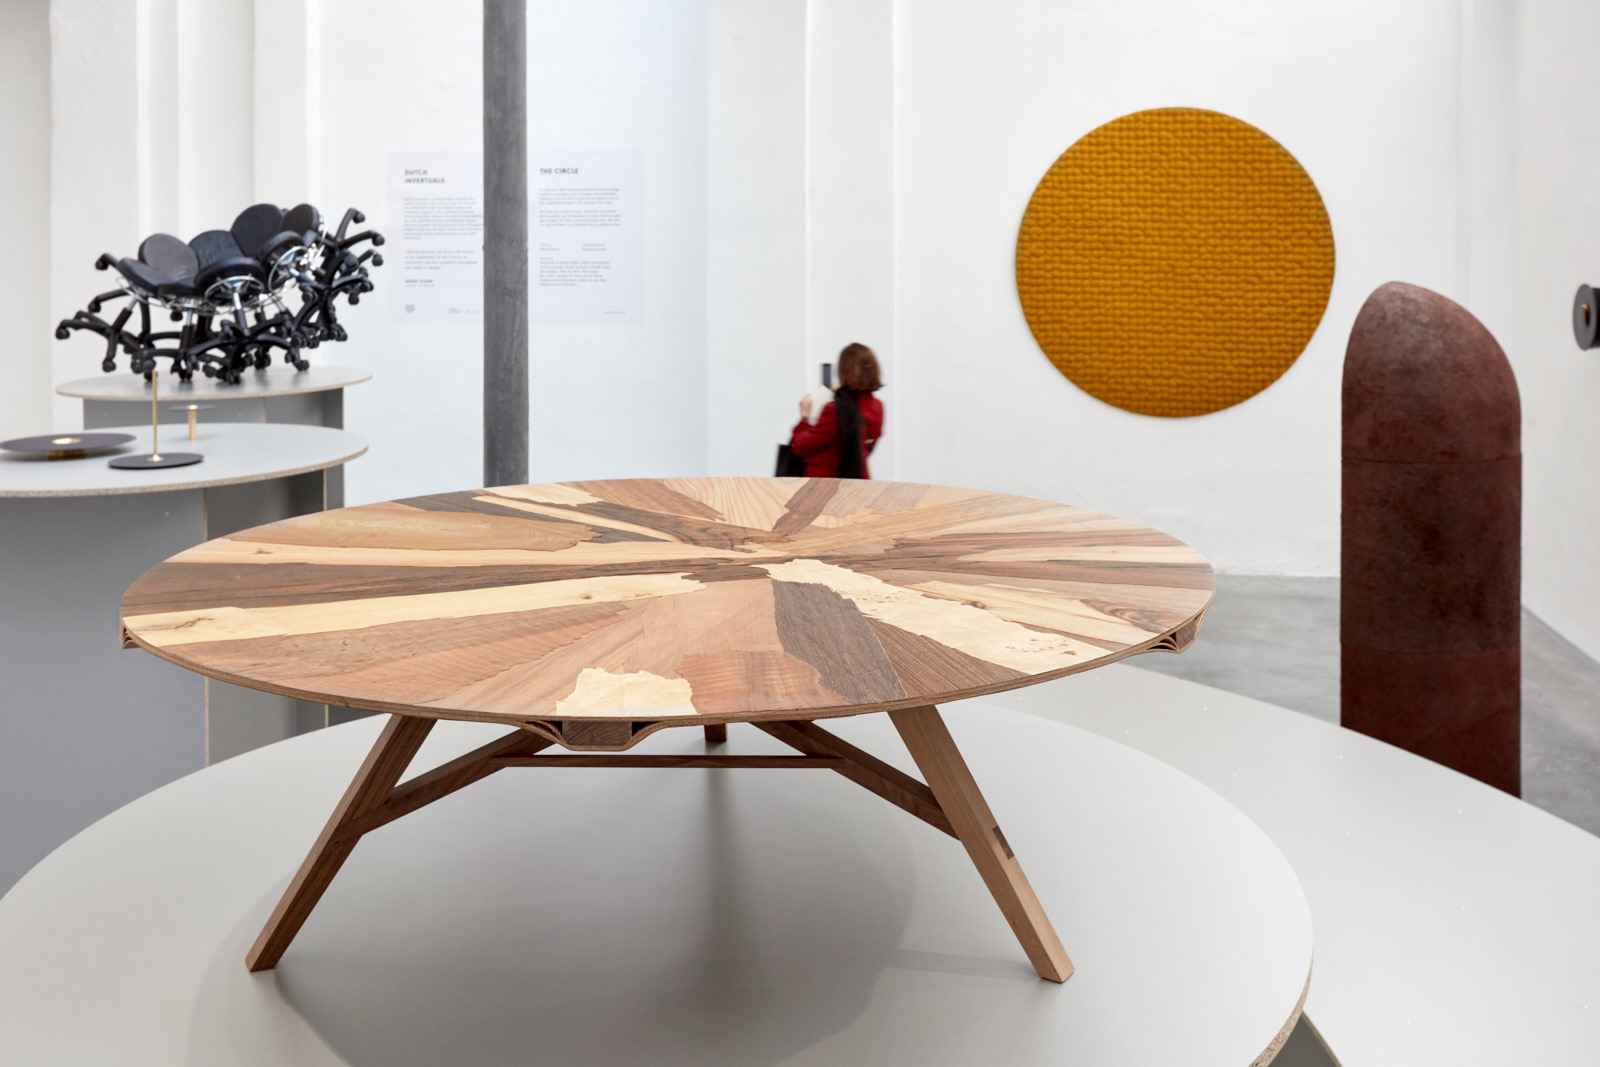 <p>Laminated coffee table op expo van Dutch Invertuals in Milaan. Foto: Ronald Smits</p>